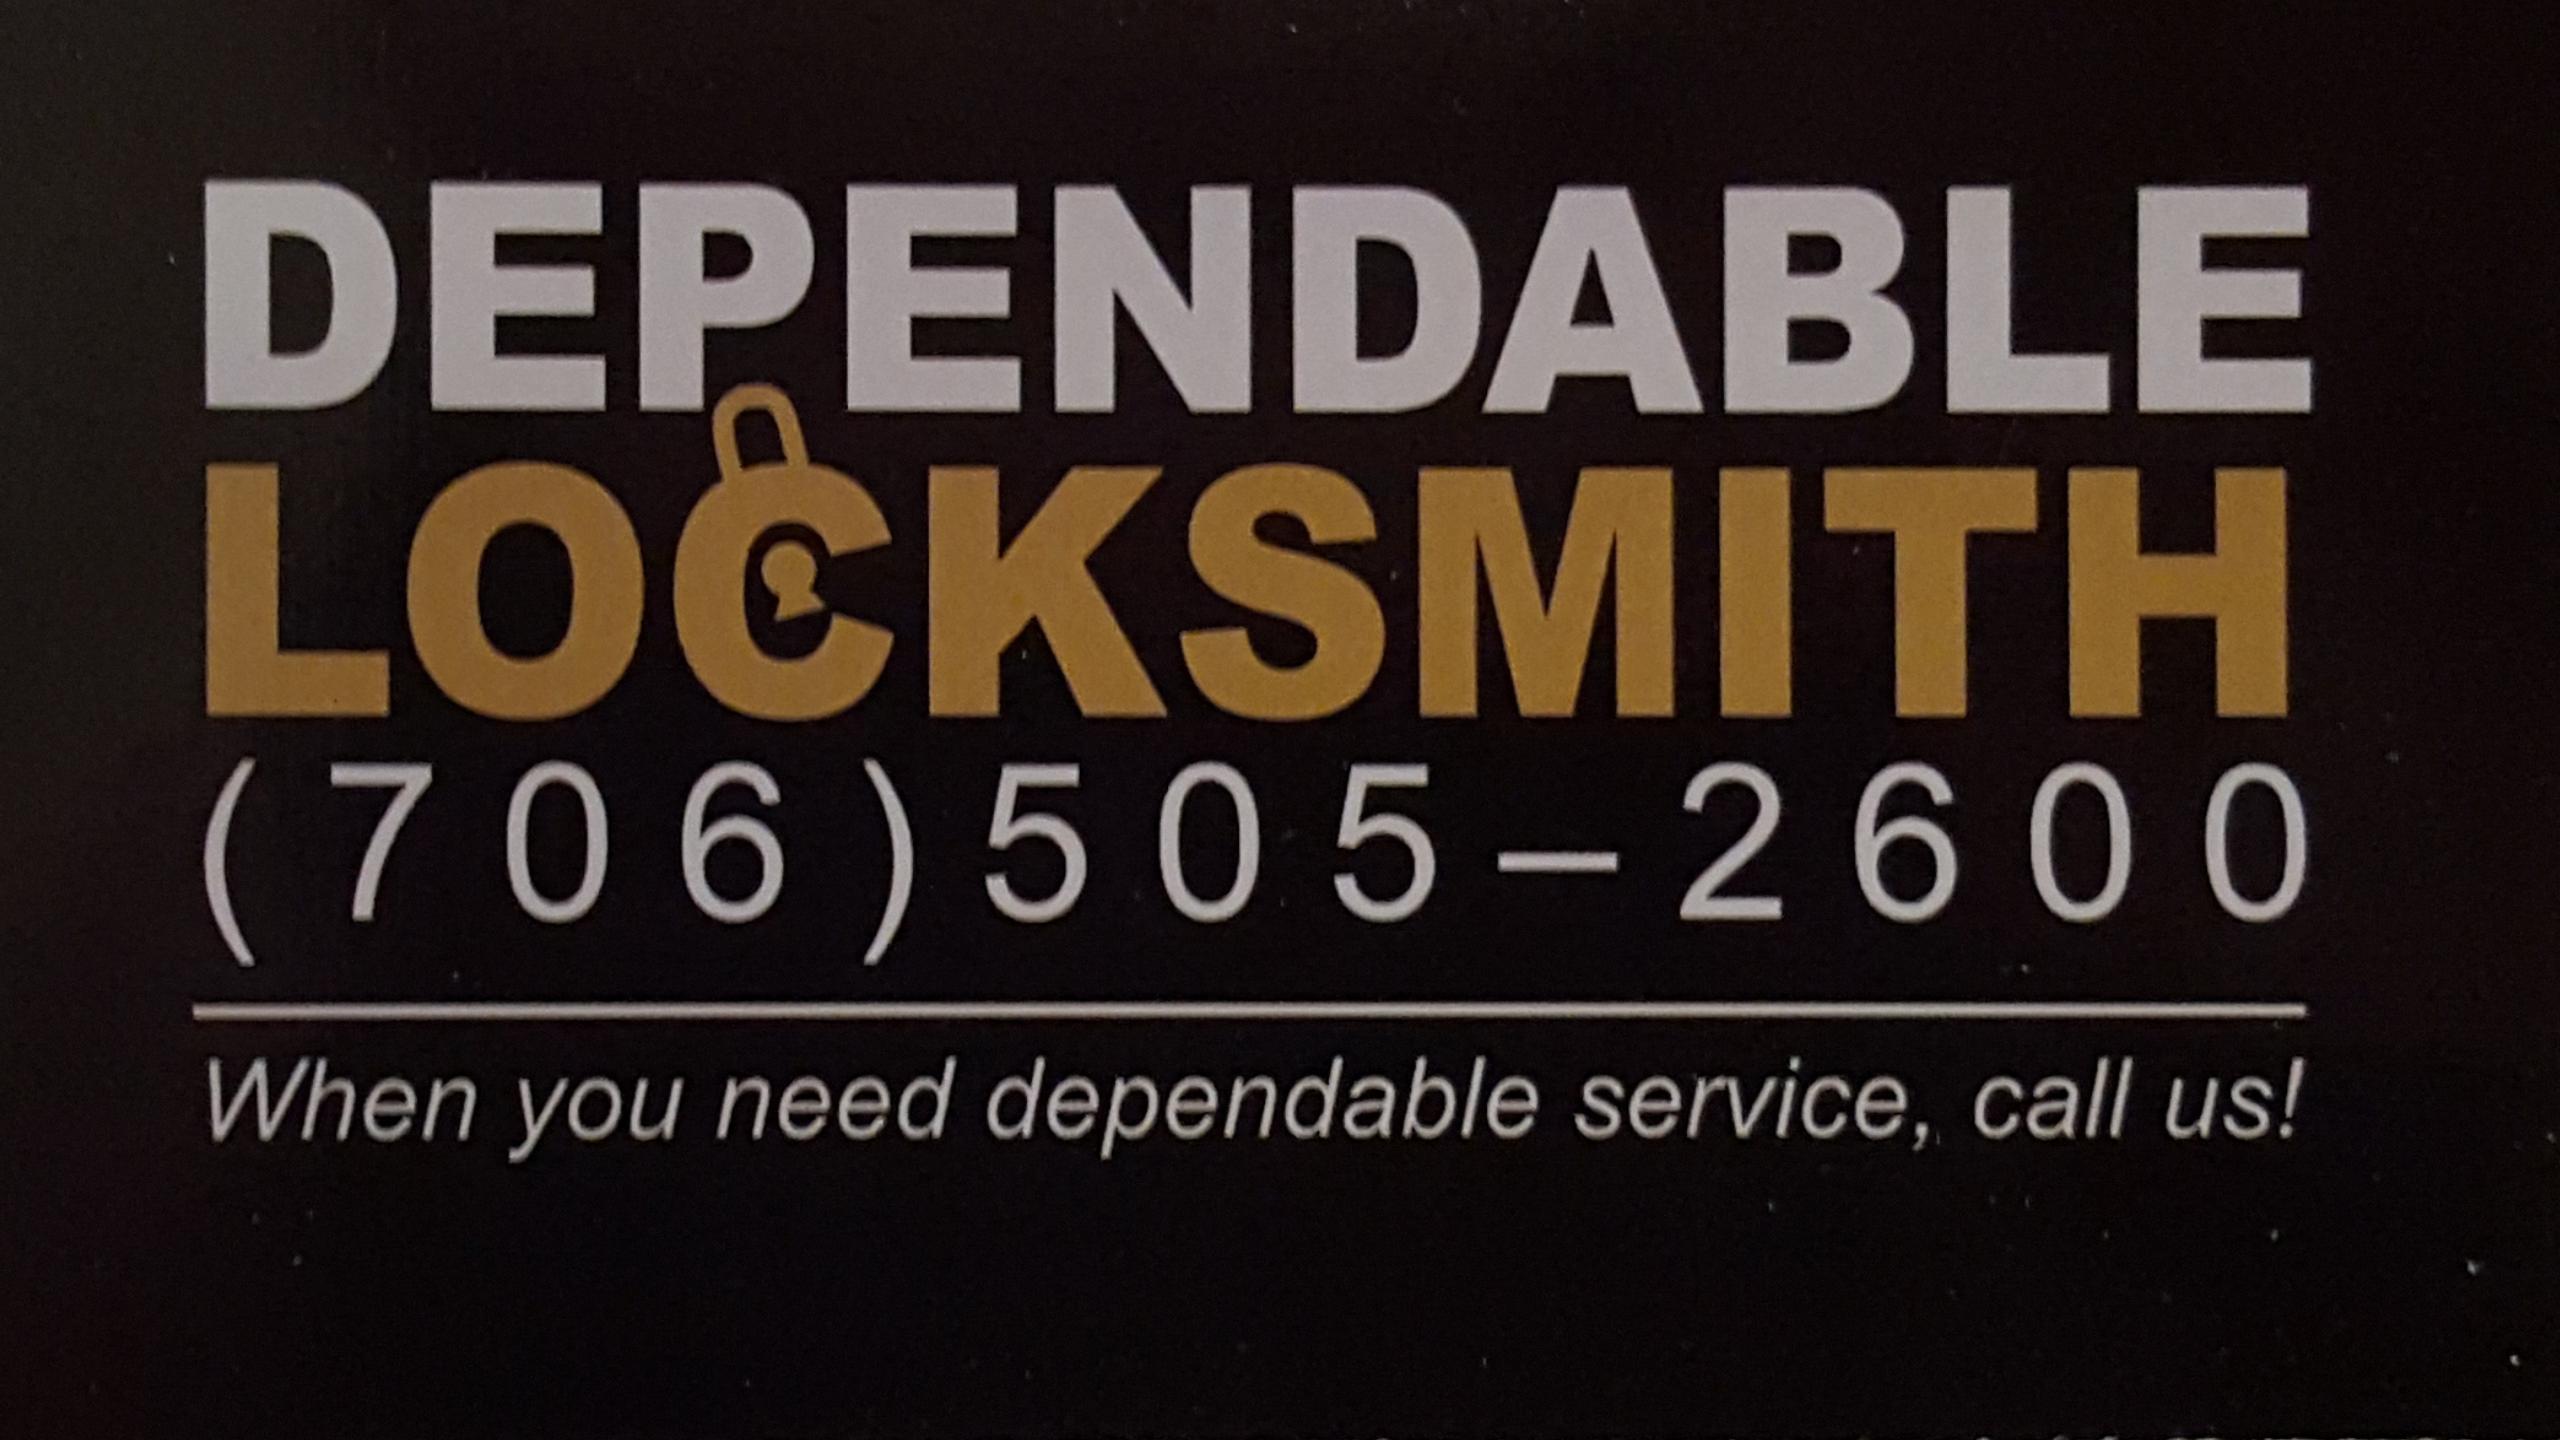 Parker Locksmith Service image 3